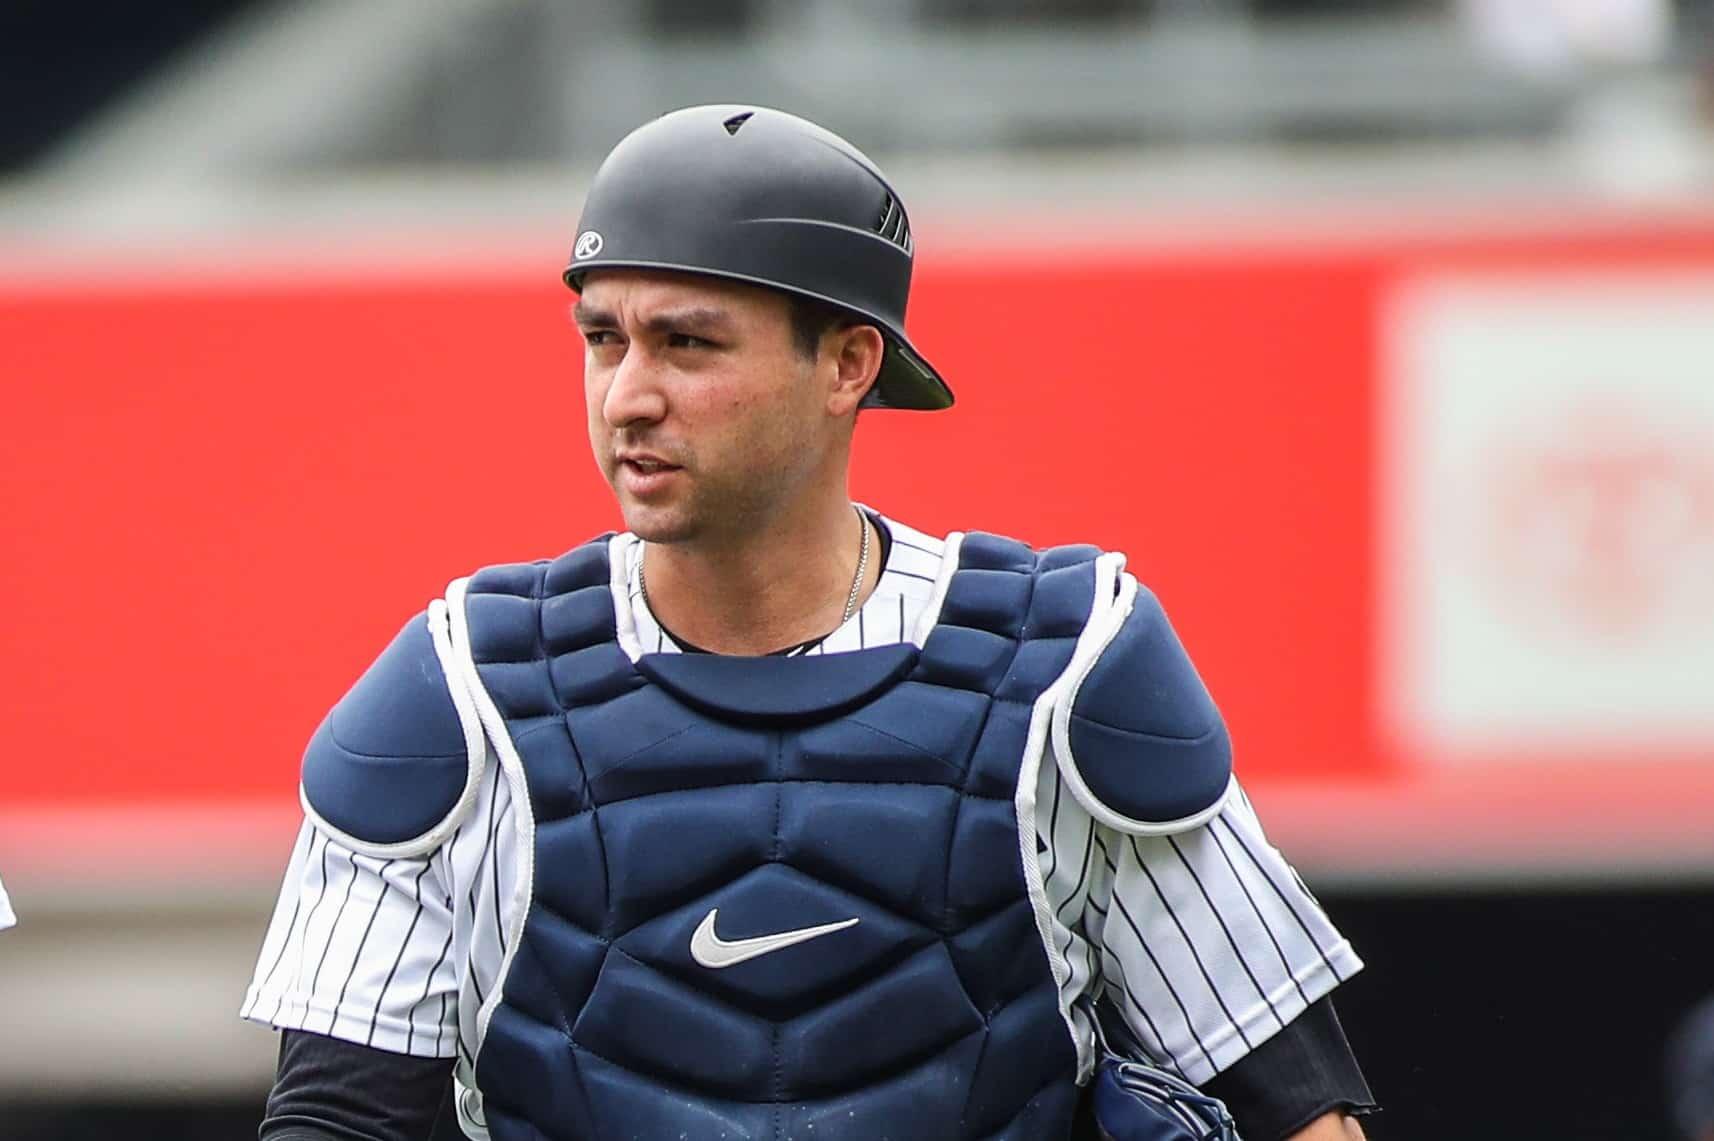 Kyle Higashioka named Yankees' nominee for Roberto Clemente Award - Elite Sports NY